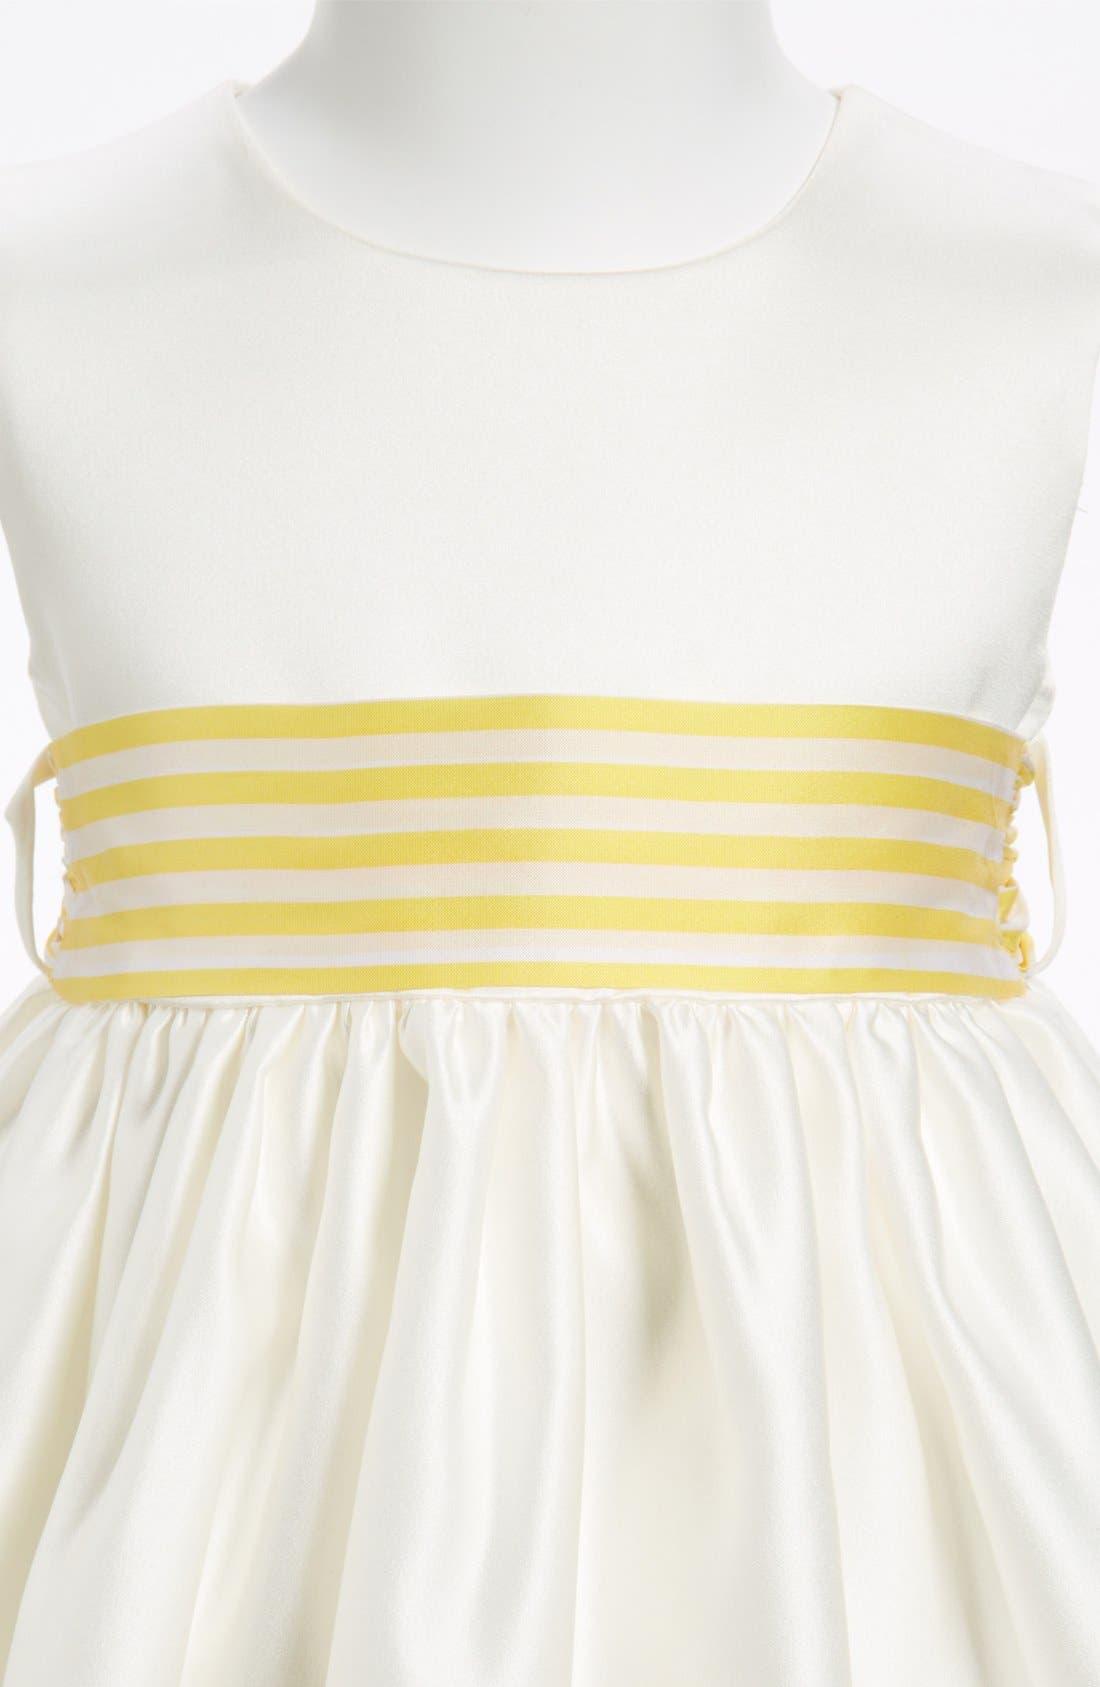 Stripe Sash,                             Alternate thumbnail 2, color,                             YELLOW STRIPE